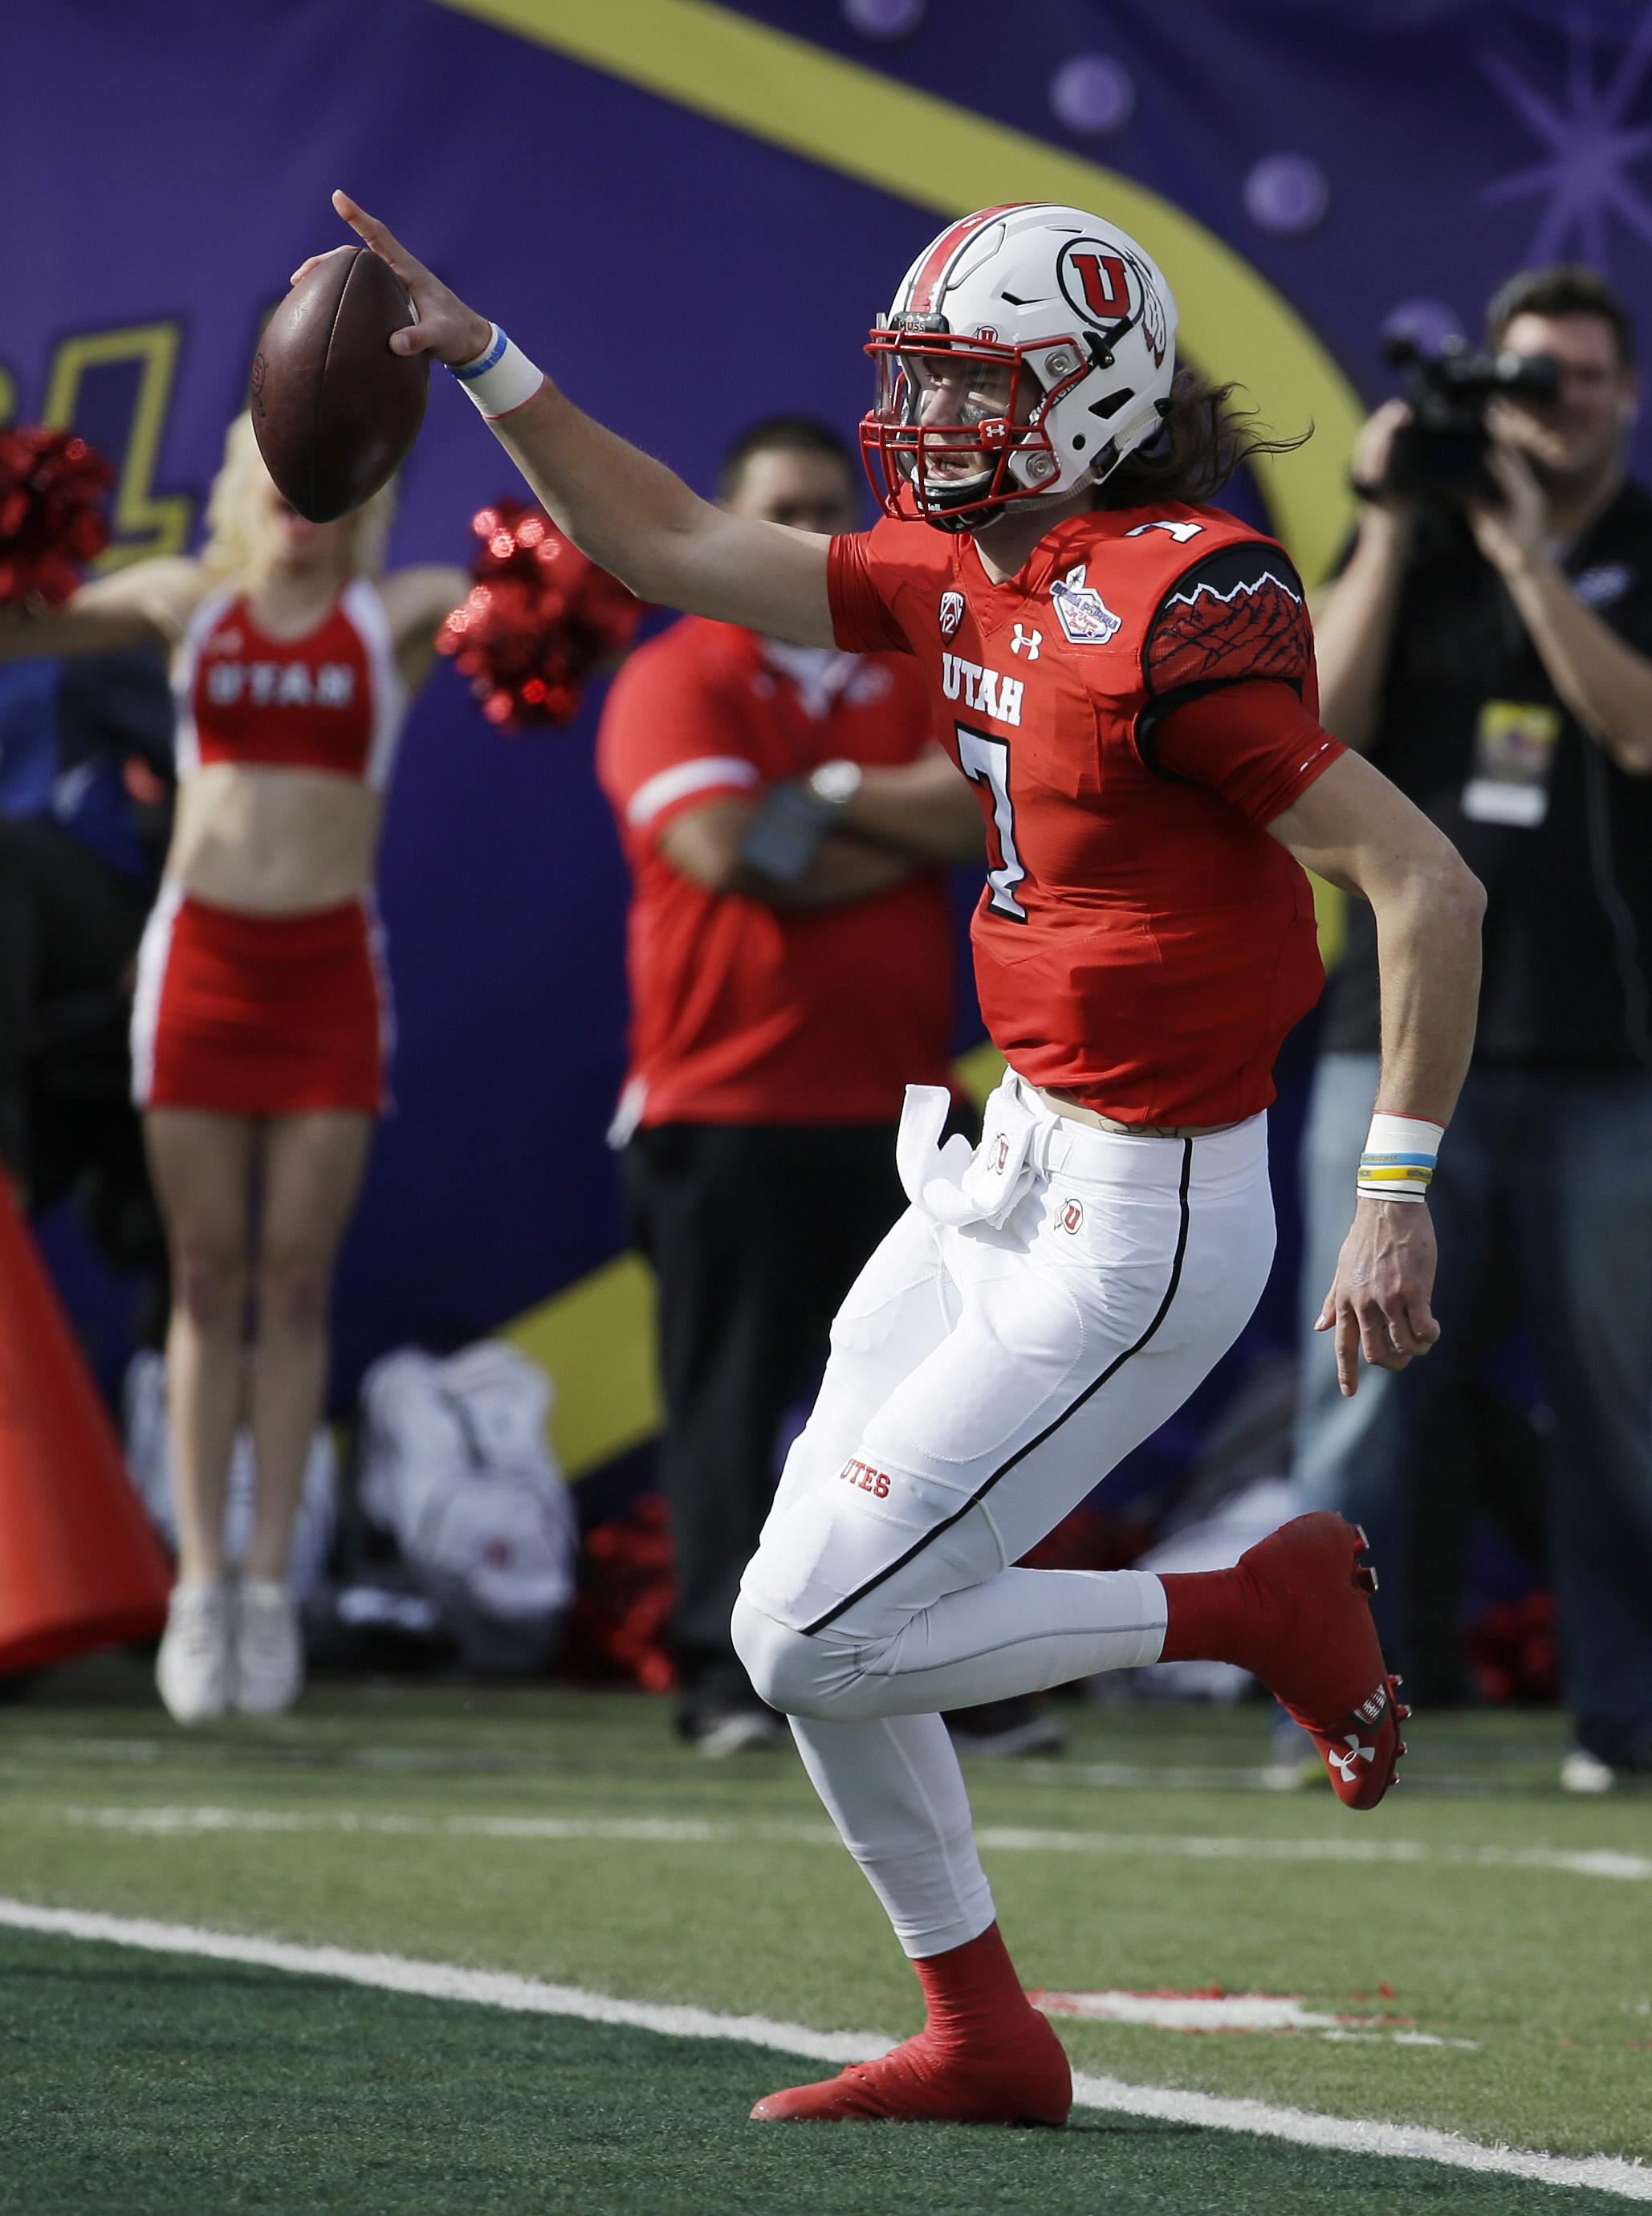 Utah quarterback Travis Wilson (7) runs for a touchdown against Colorado State during the first half of the Las Vegas Bowl NCAA college football game Saturday, Dec. 20, 2014, in Las Vegas. (AP Photo/John Locher)